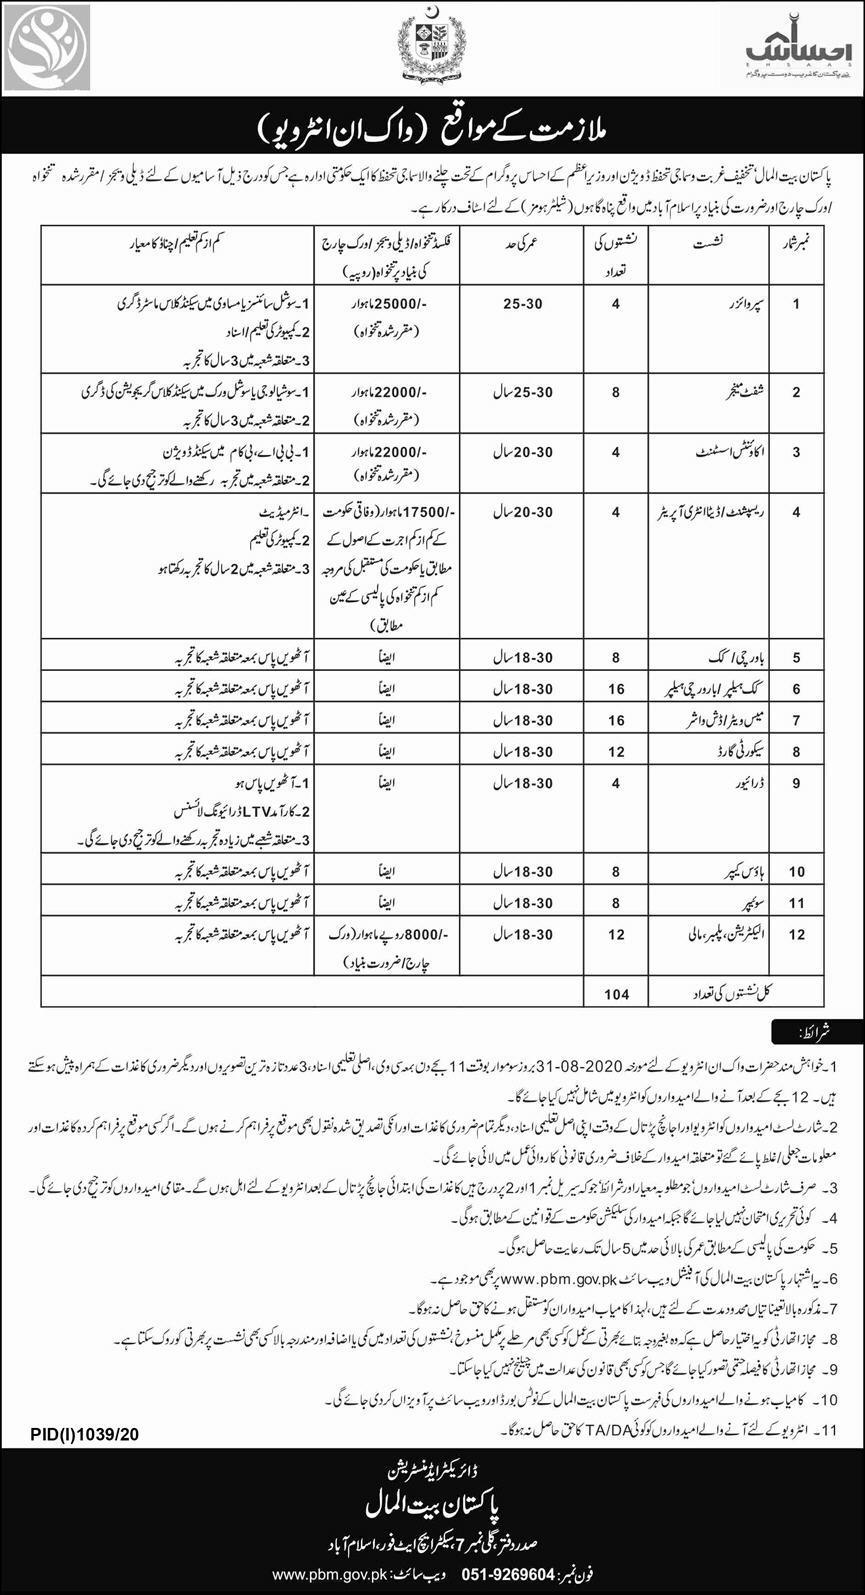 Pakistan Bait ul Mal Jobs 2020 for Supervisors | 104 Jobs